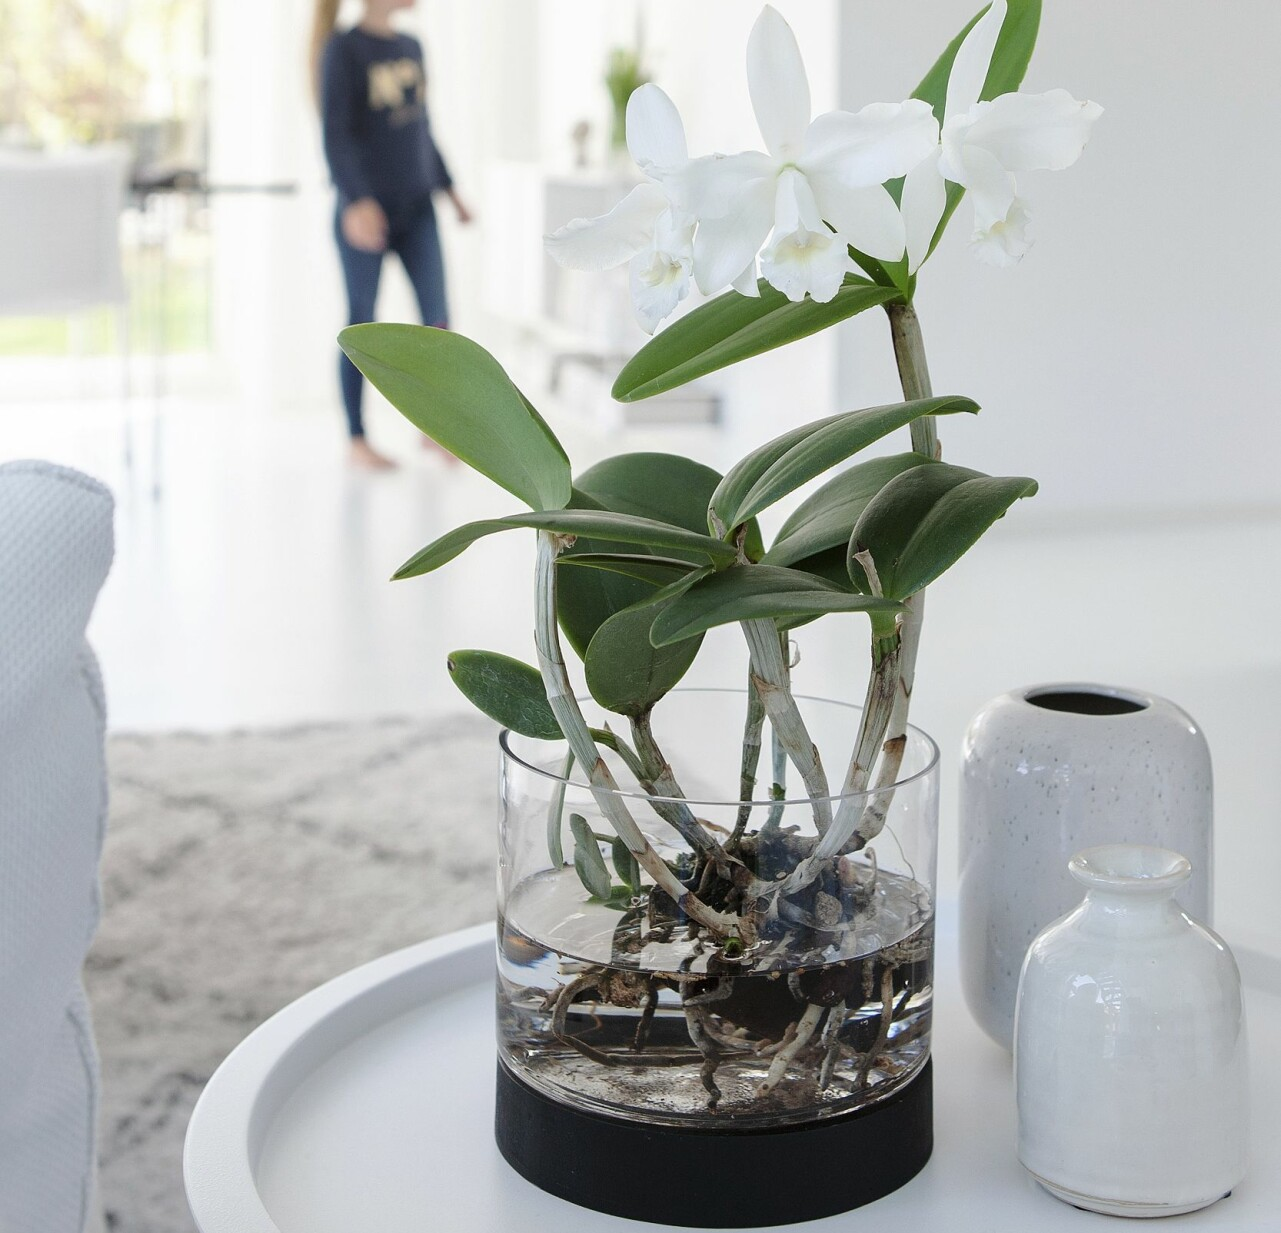 Vit orkidé med rötterna fria i vatten.